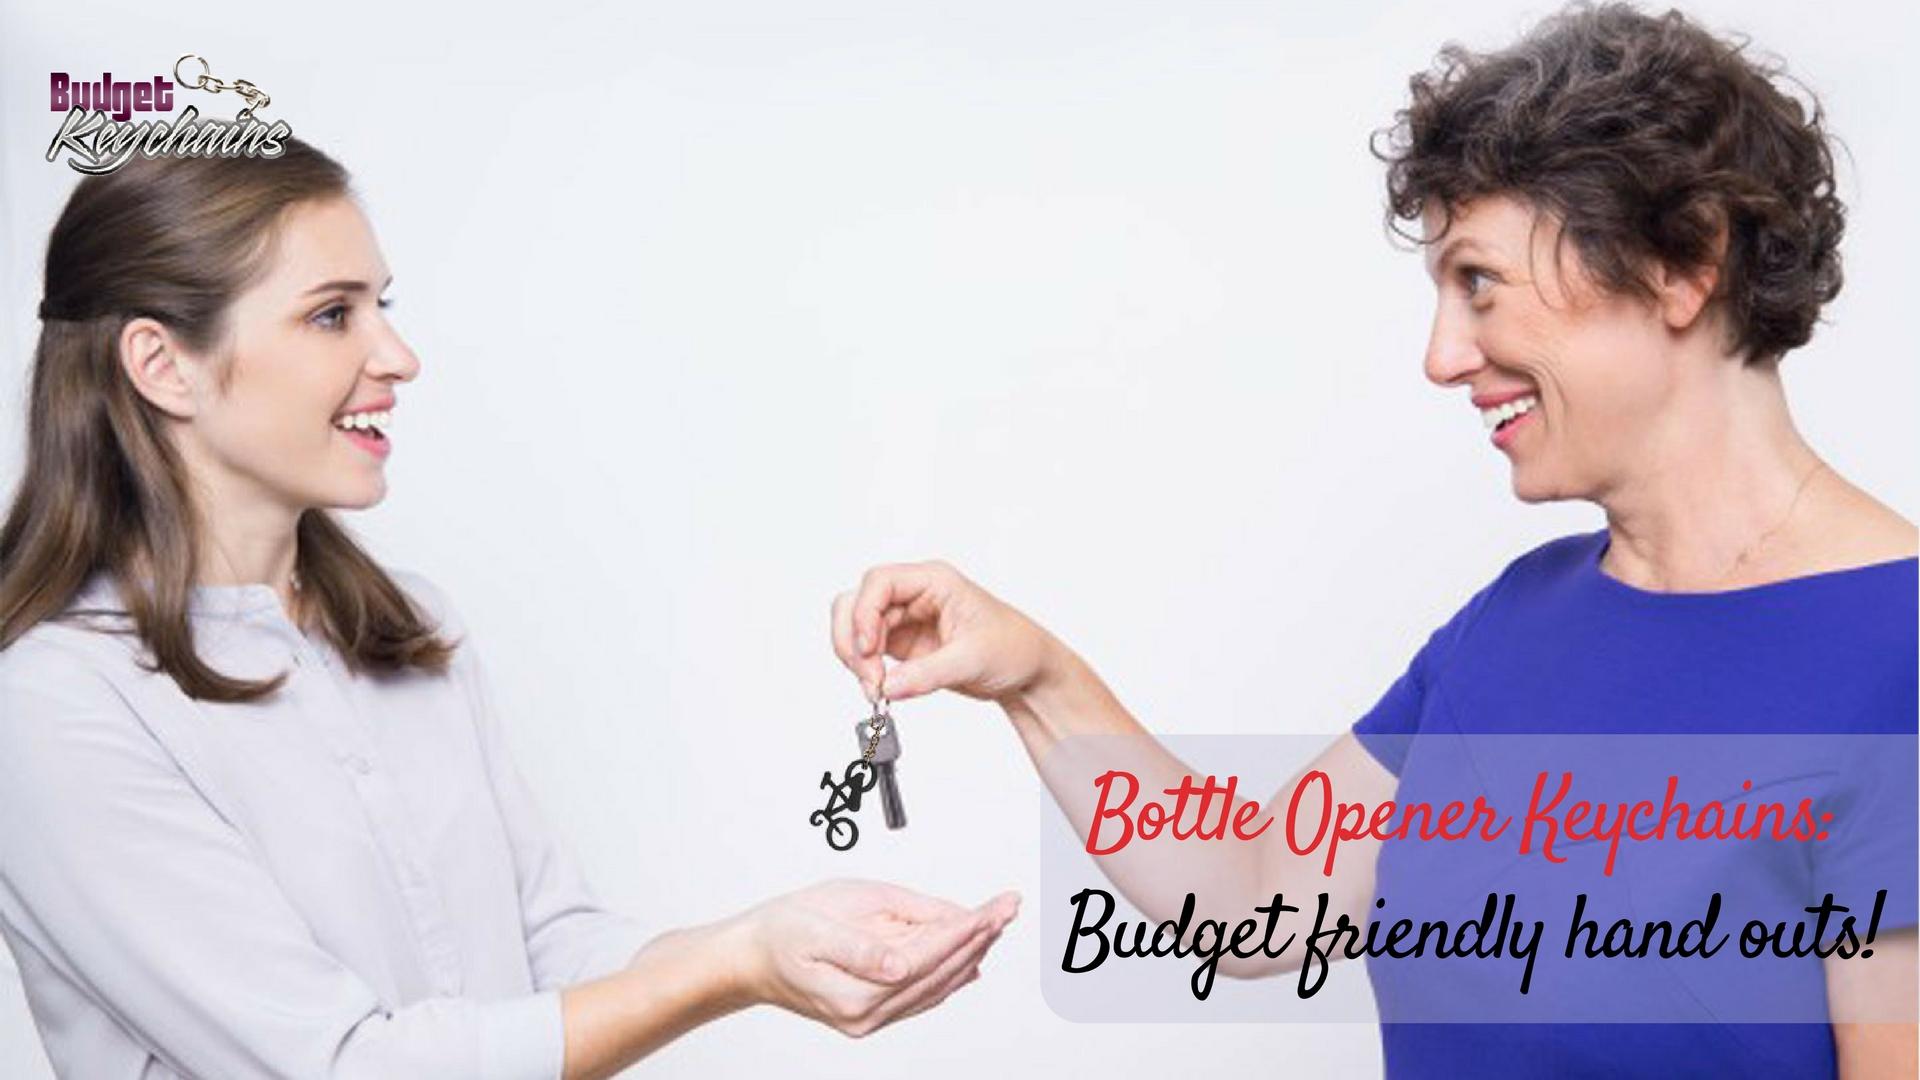 budgetFriendly-handouts-bottleOpener-keychains